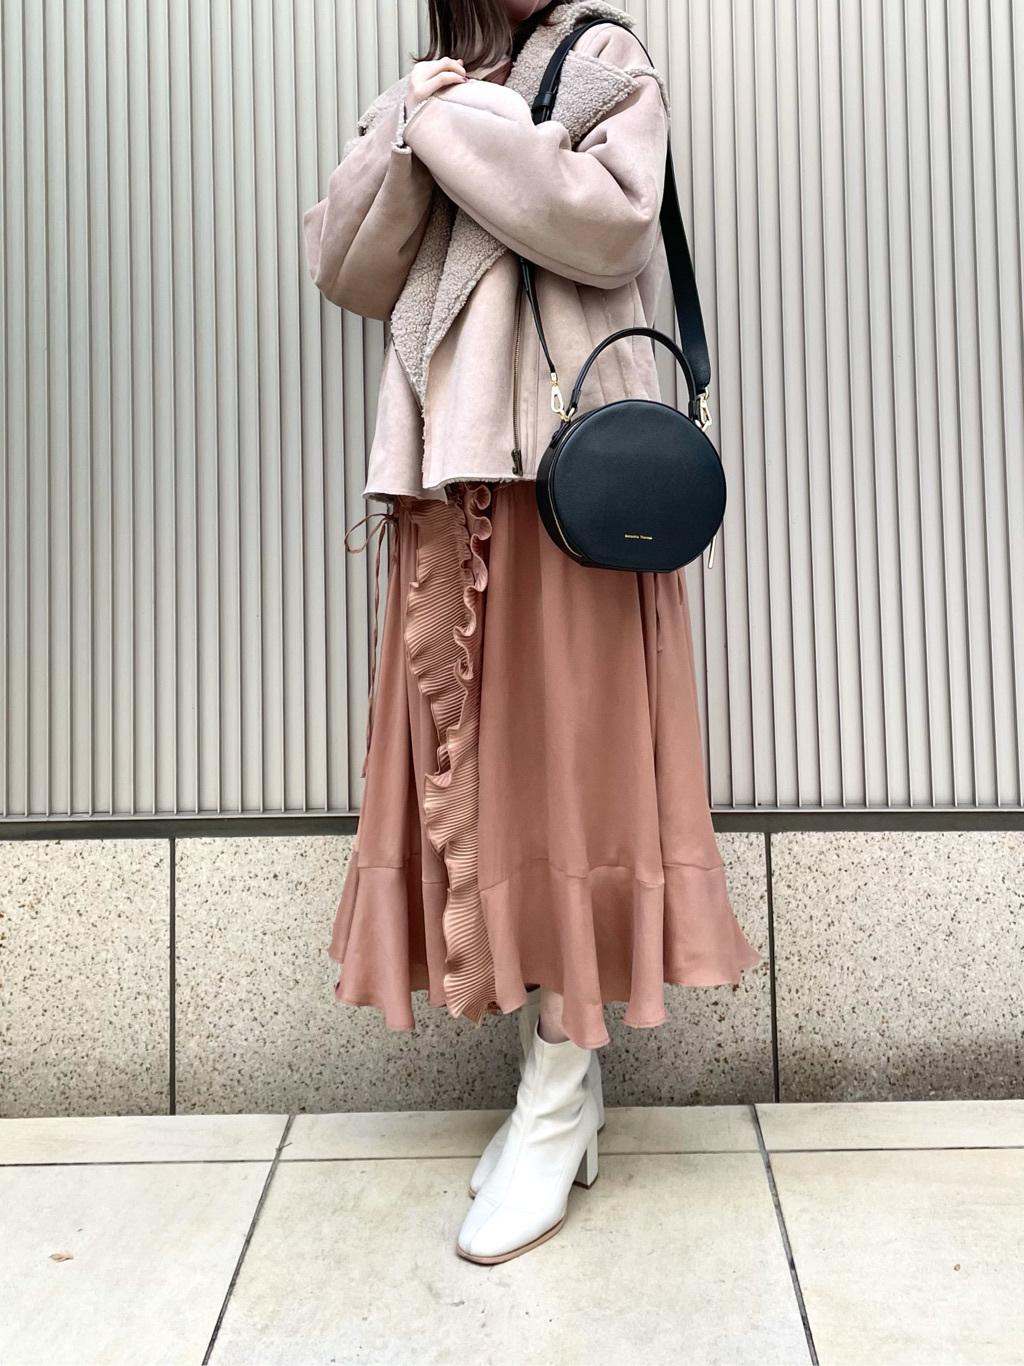 mayumi